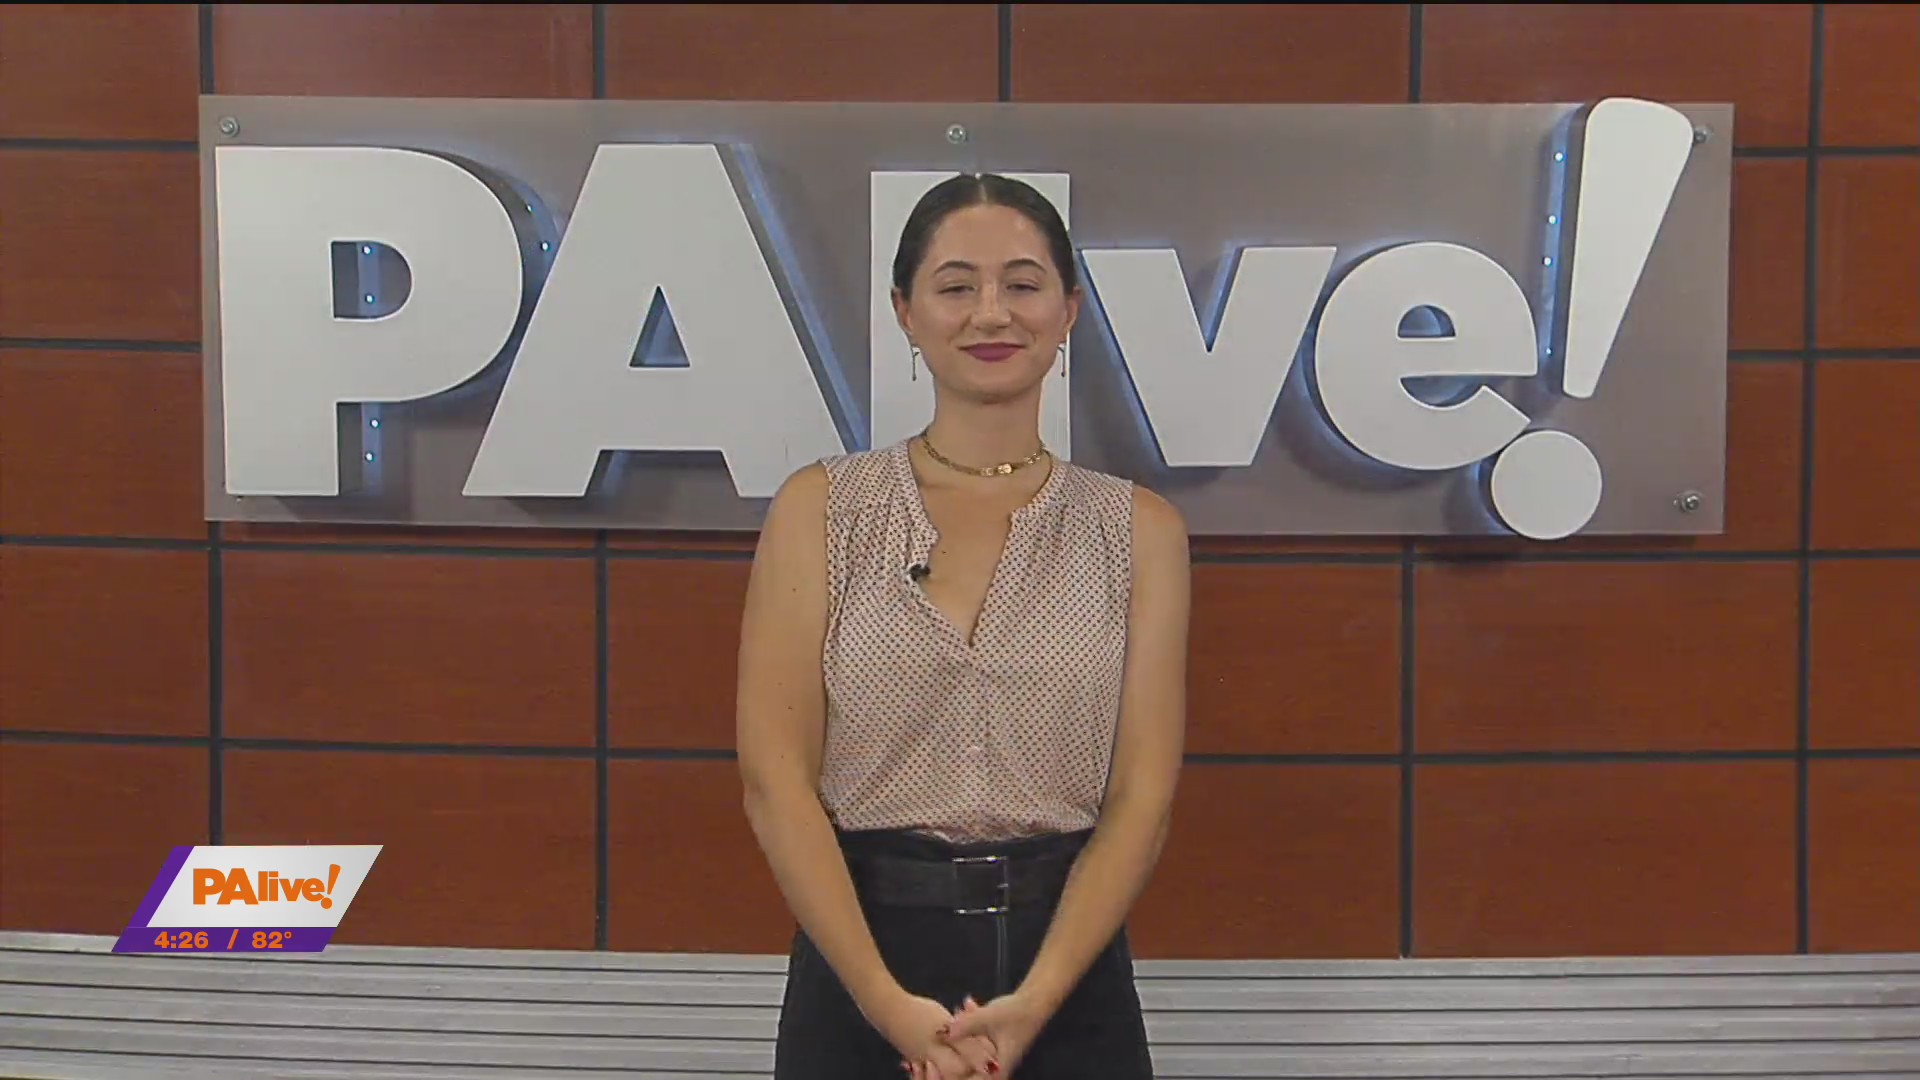 PAlive! Ania Rawa August 5, 2020